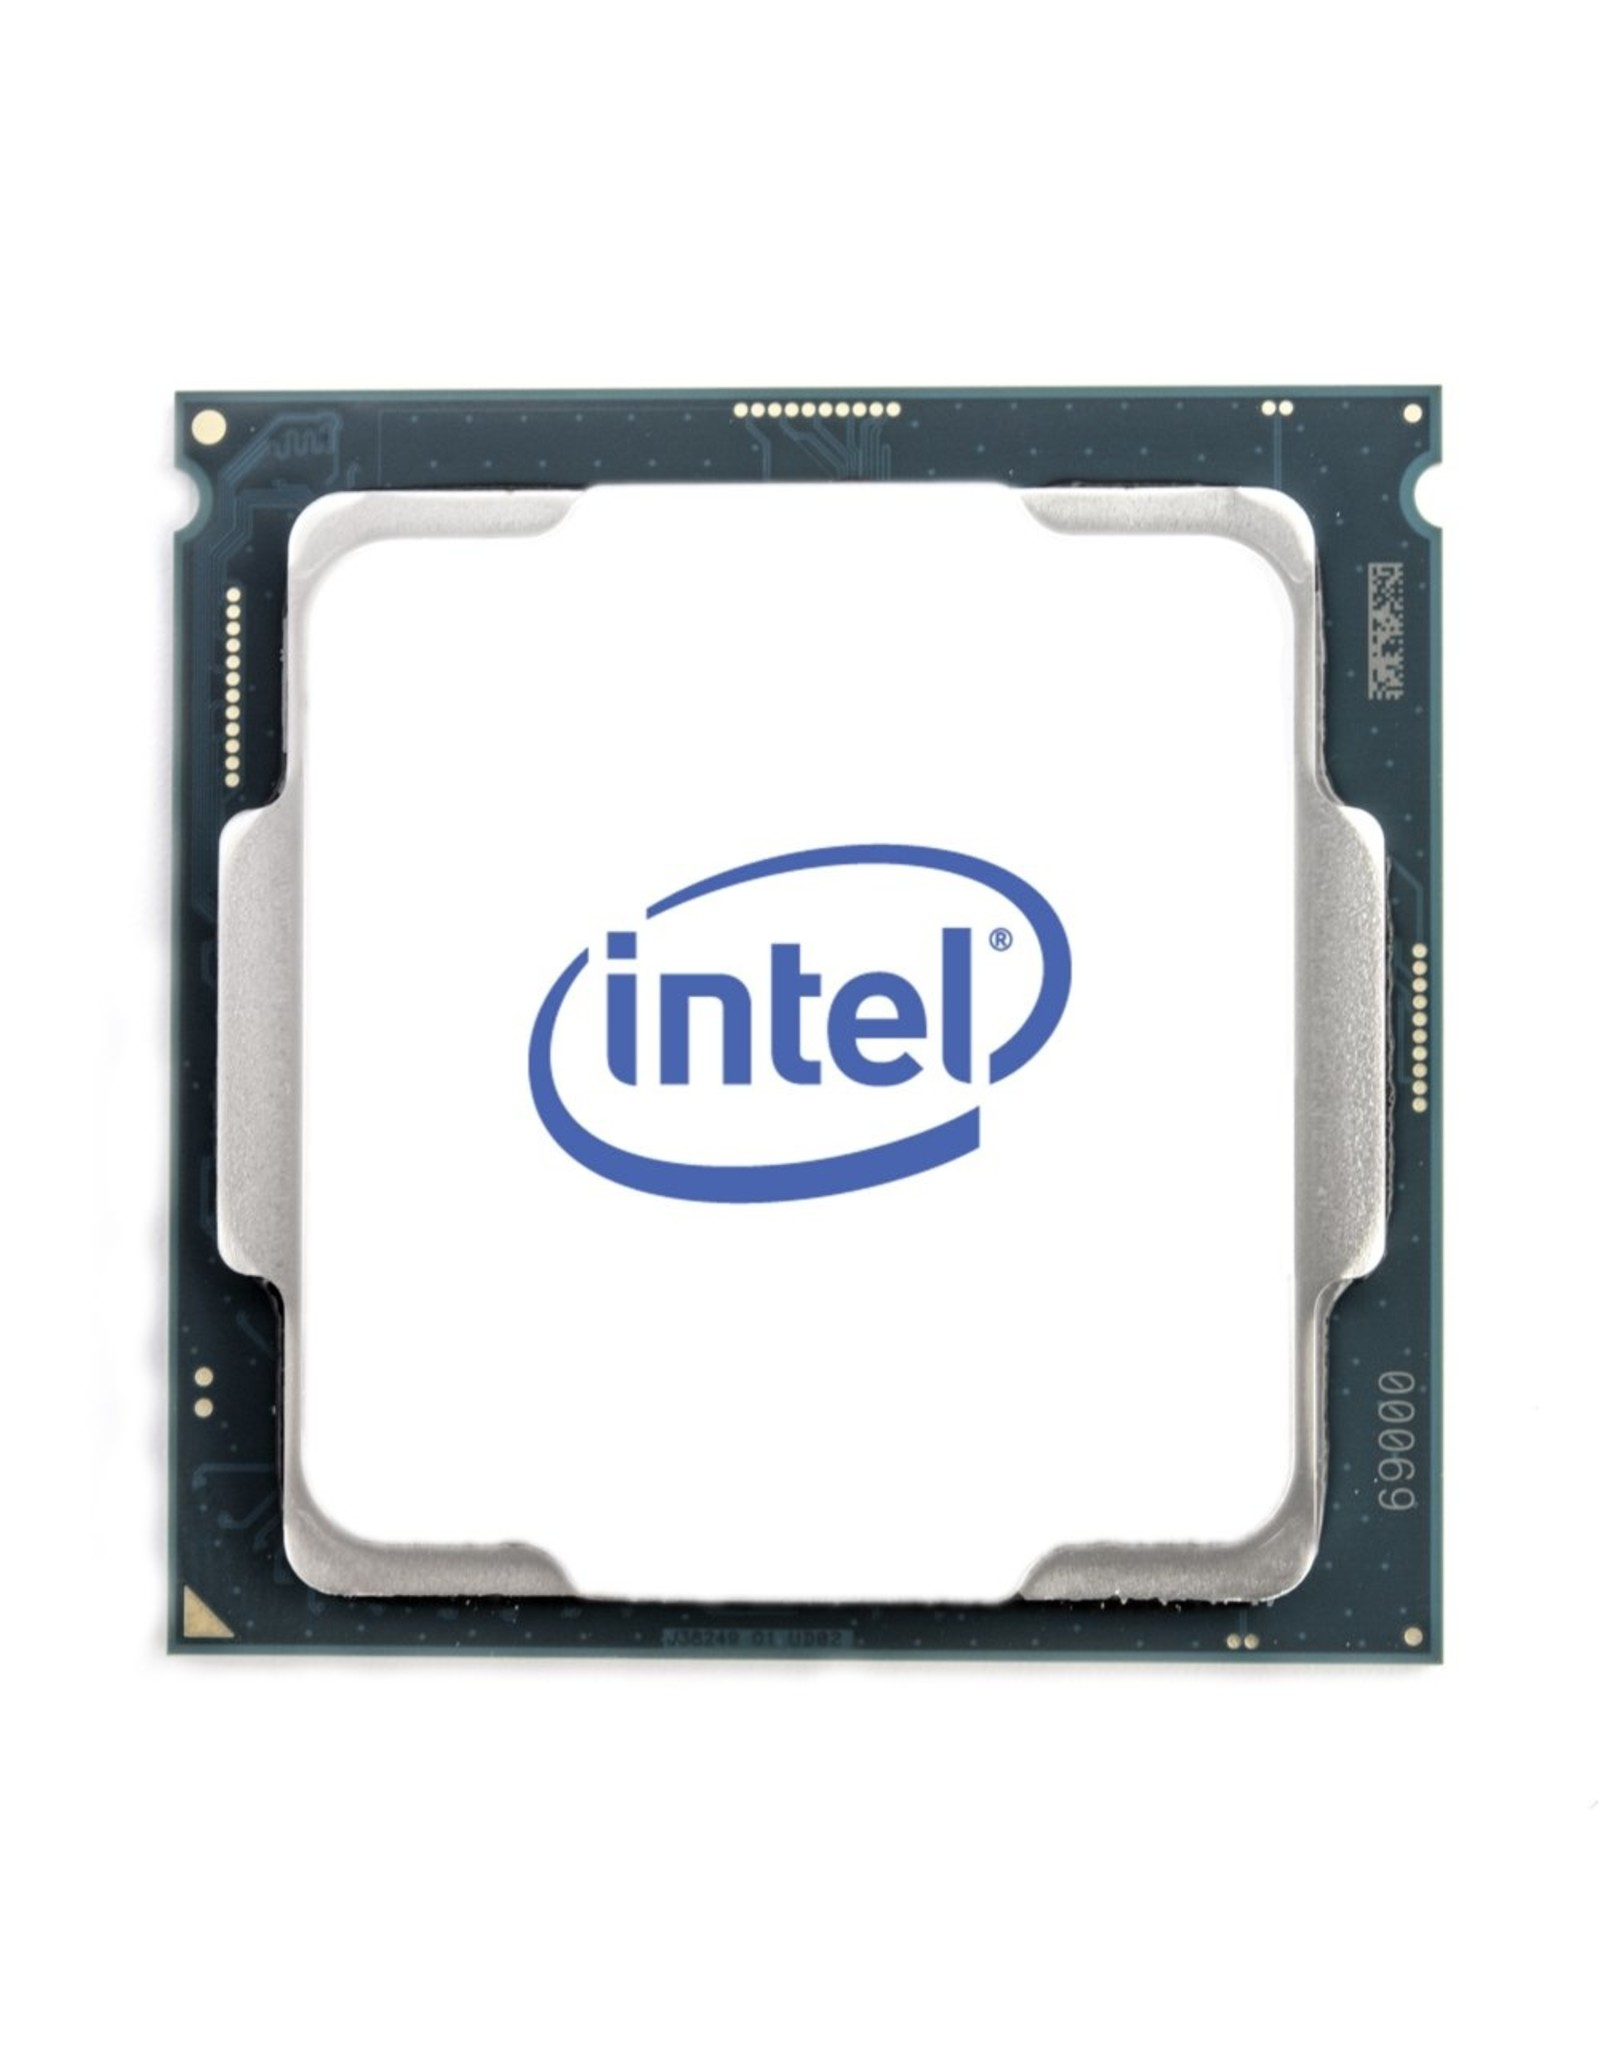 Intel CPU ® Core™ i7-11700K 11th/3.6-5.0/ 8core /LGA1200 Box